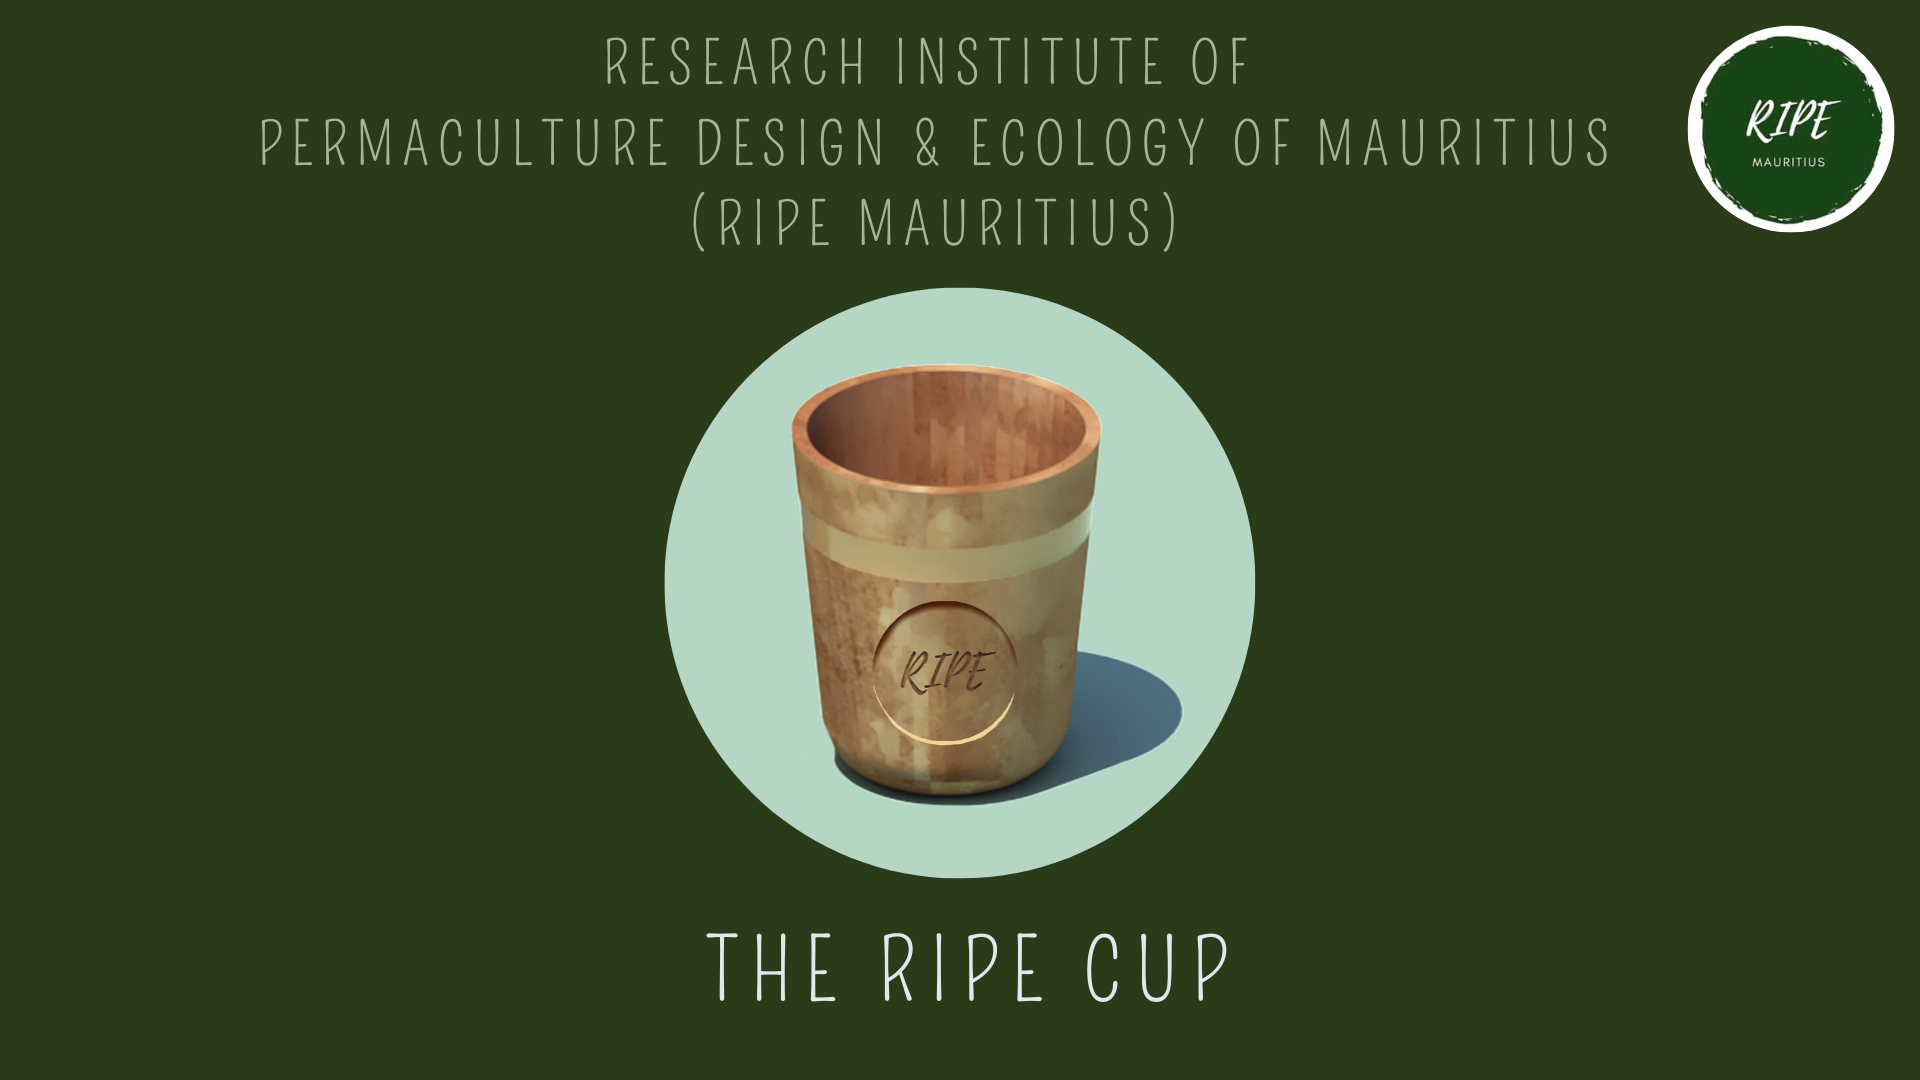 RIPE Mauritius